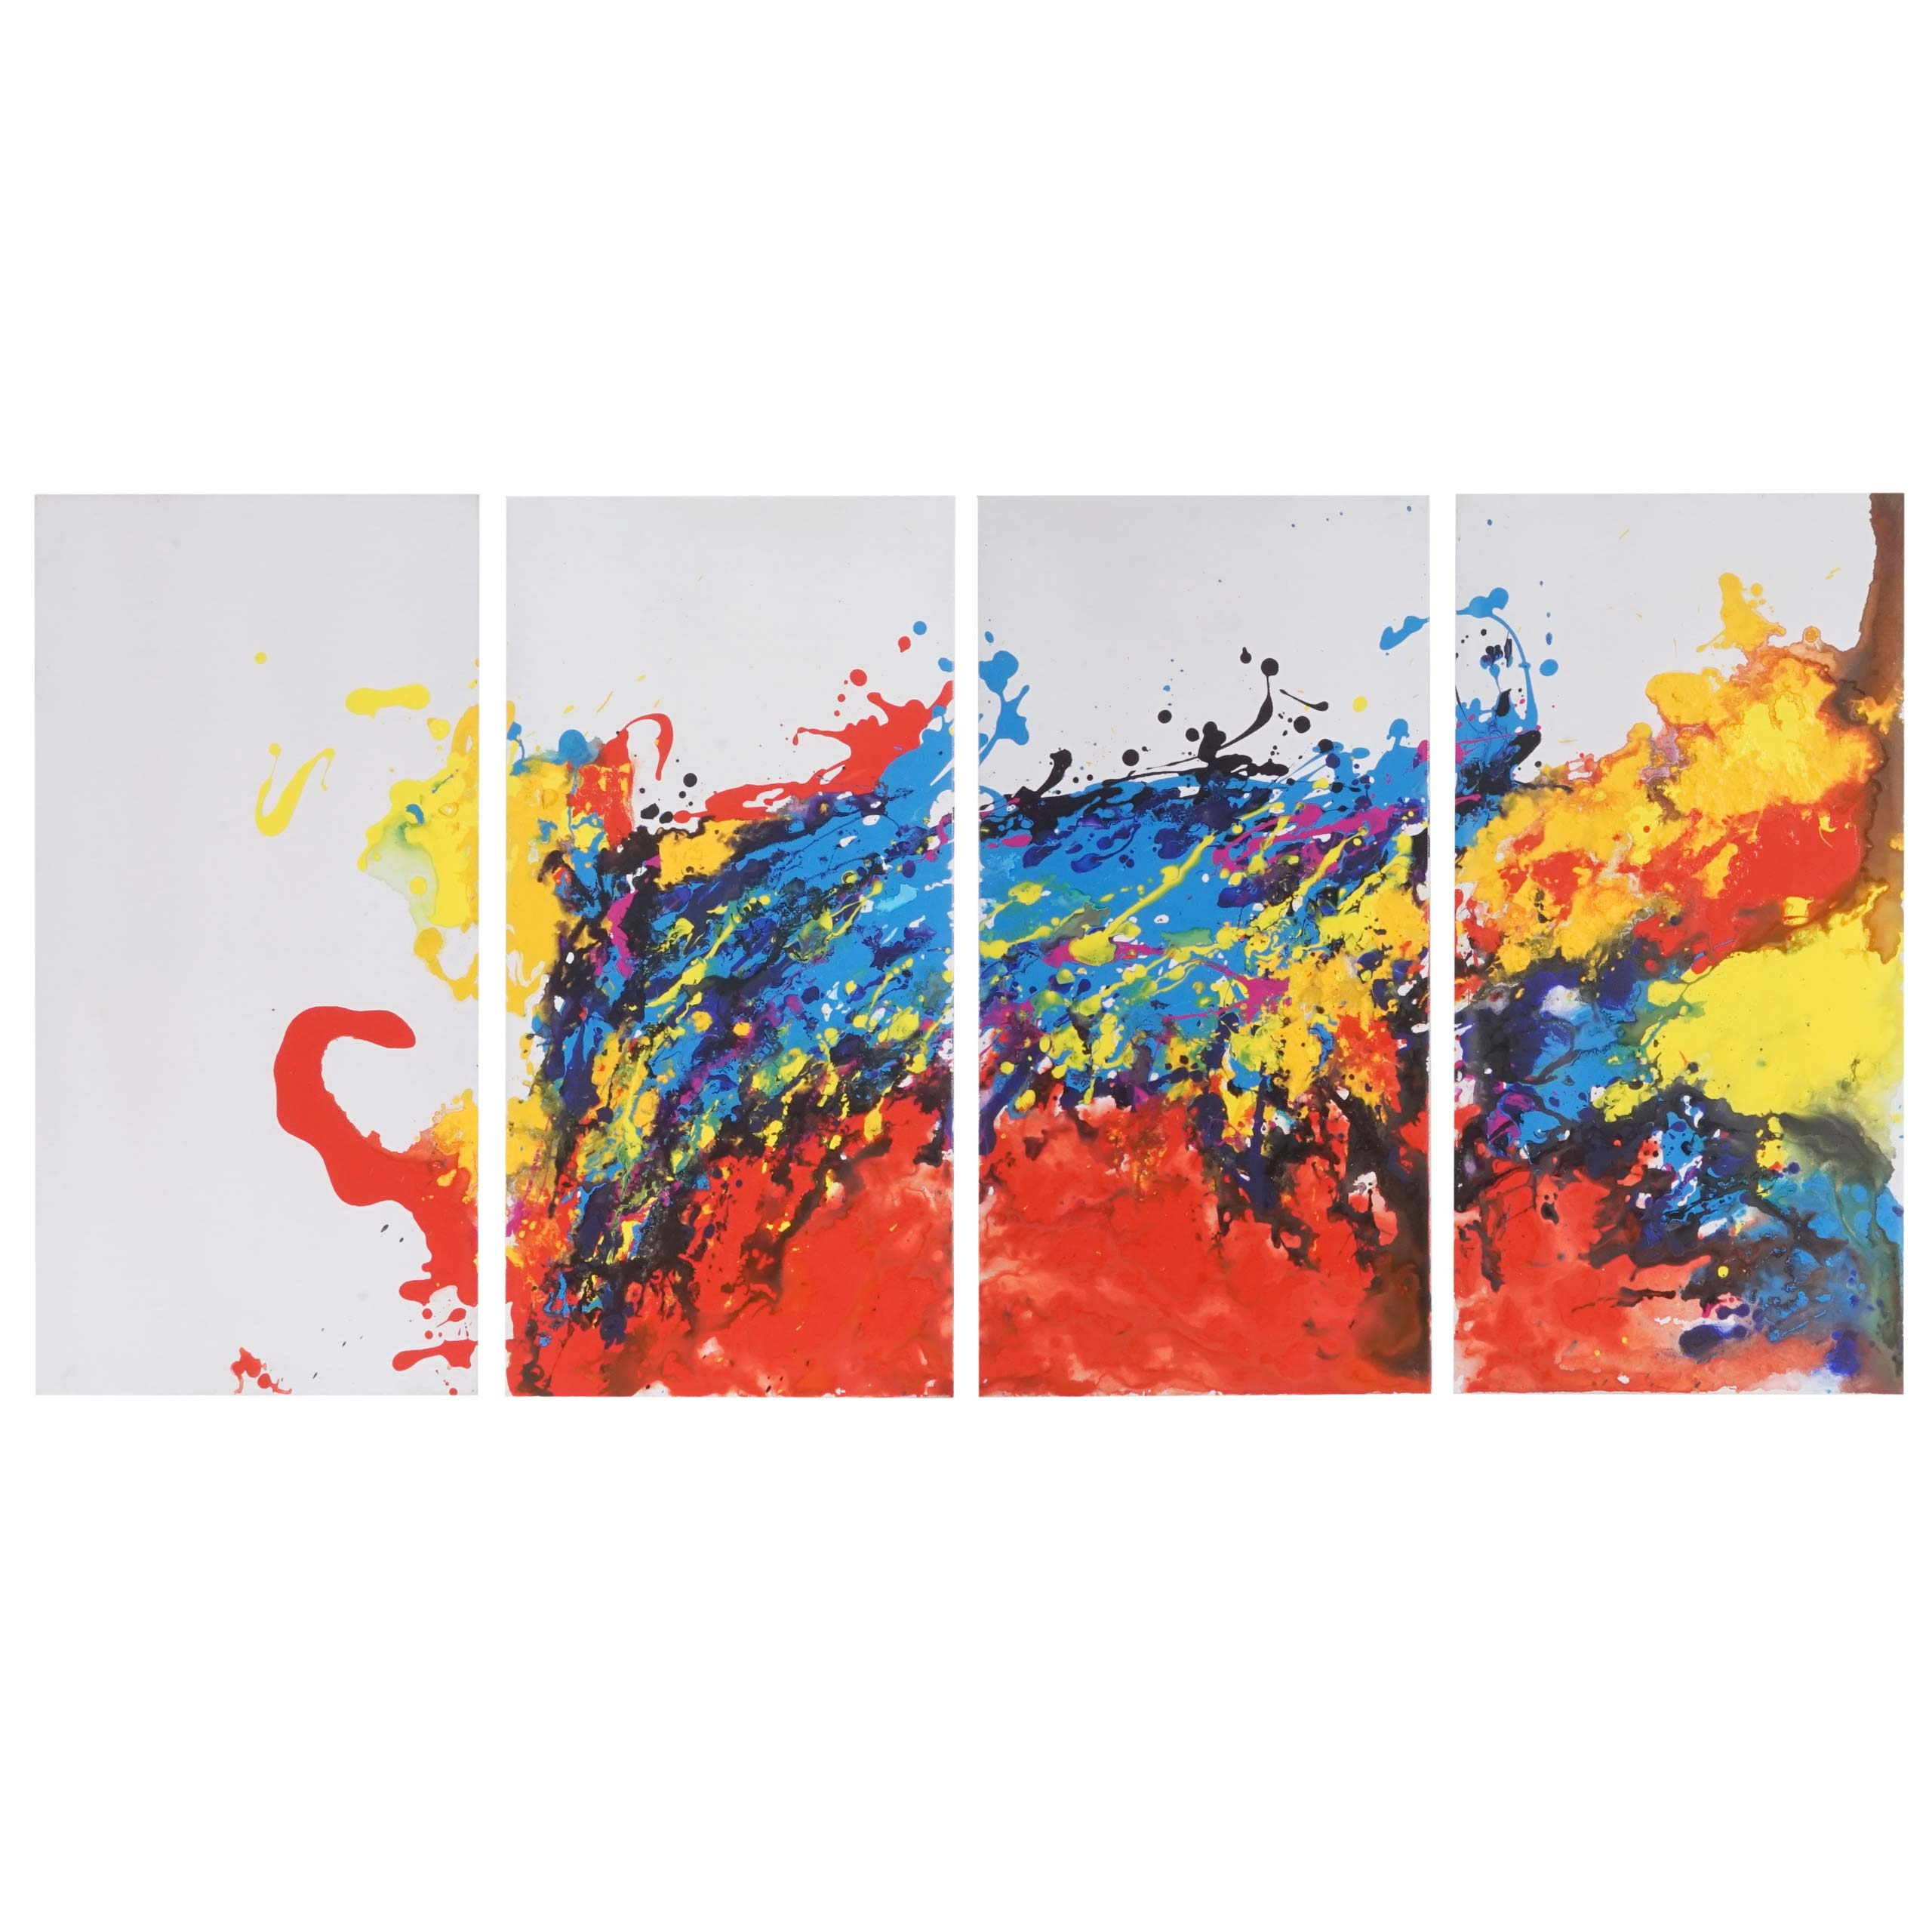 Mendler Ölgemälde Wave, 100% handgemaltes Wandbild Gemälde XL, 120x60cm ~ Variantenangebot 44766